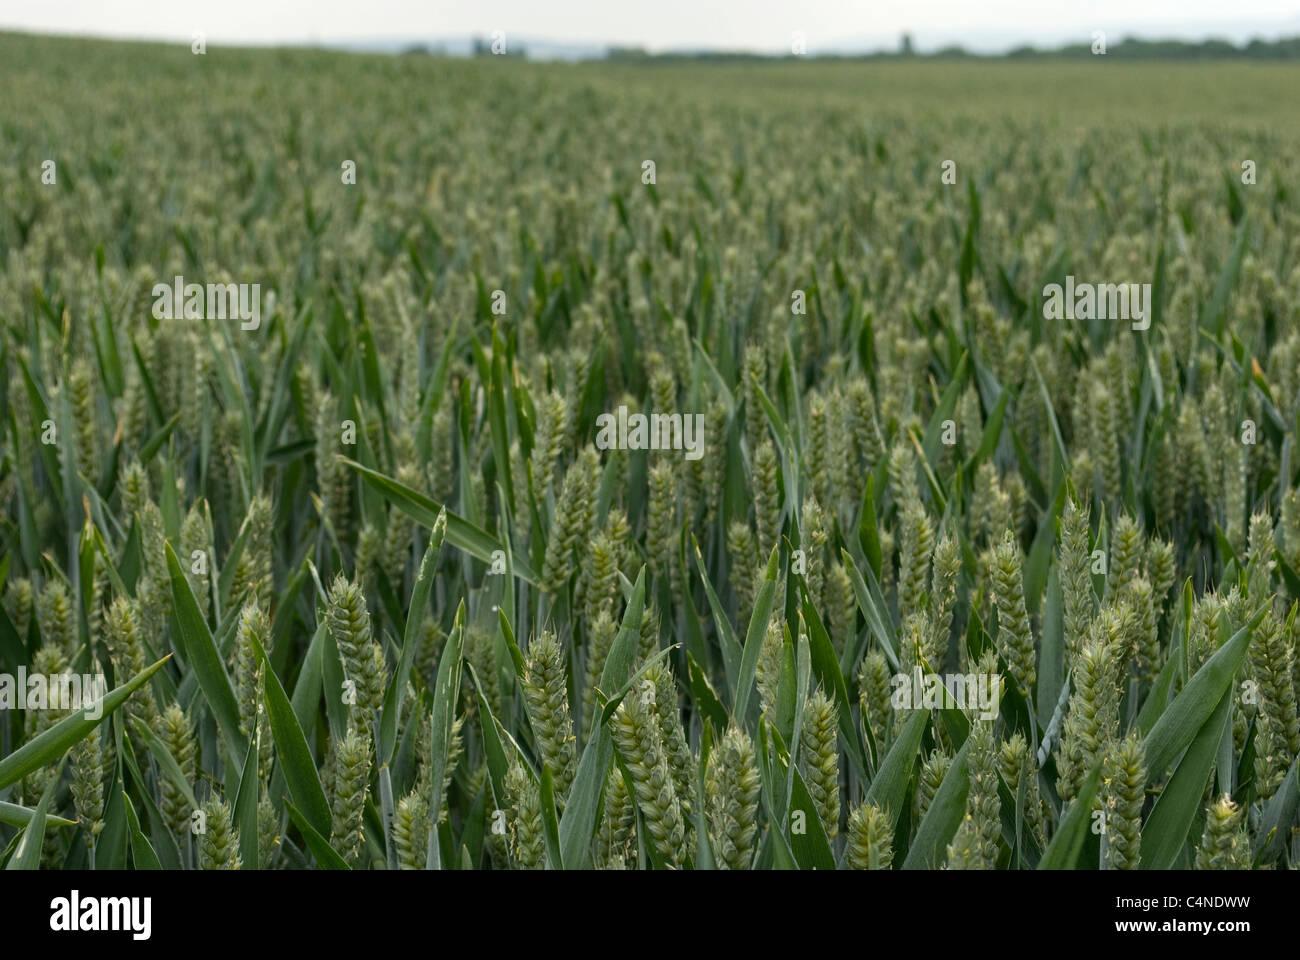 Unripe wheat field - Stock Image